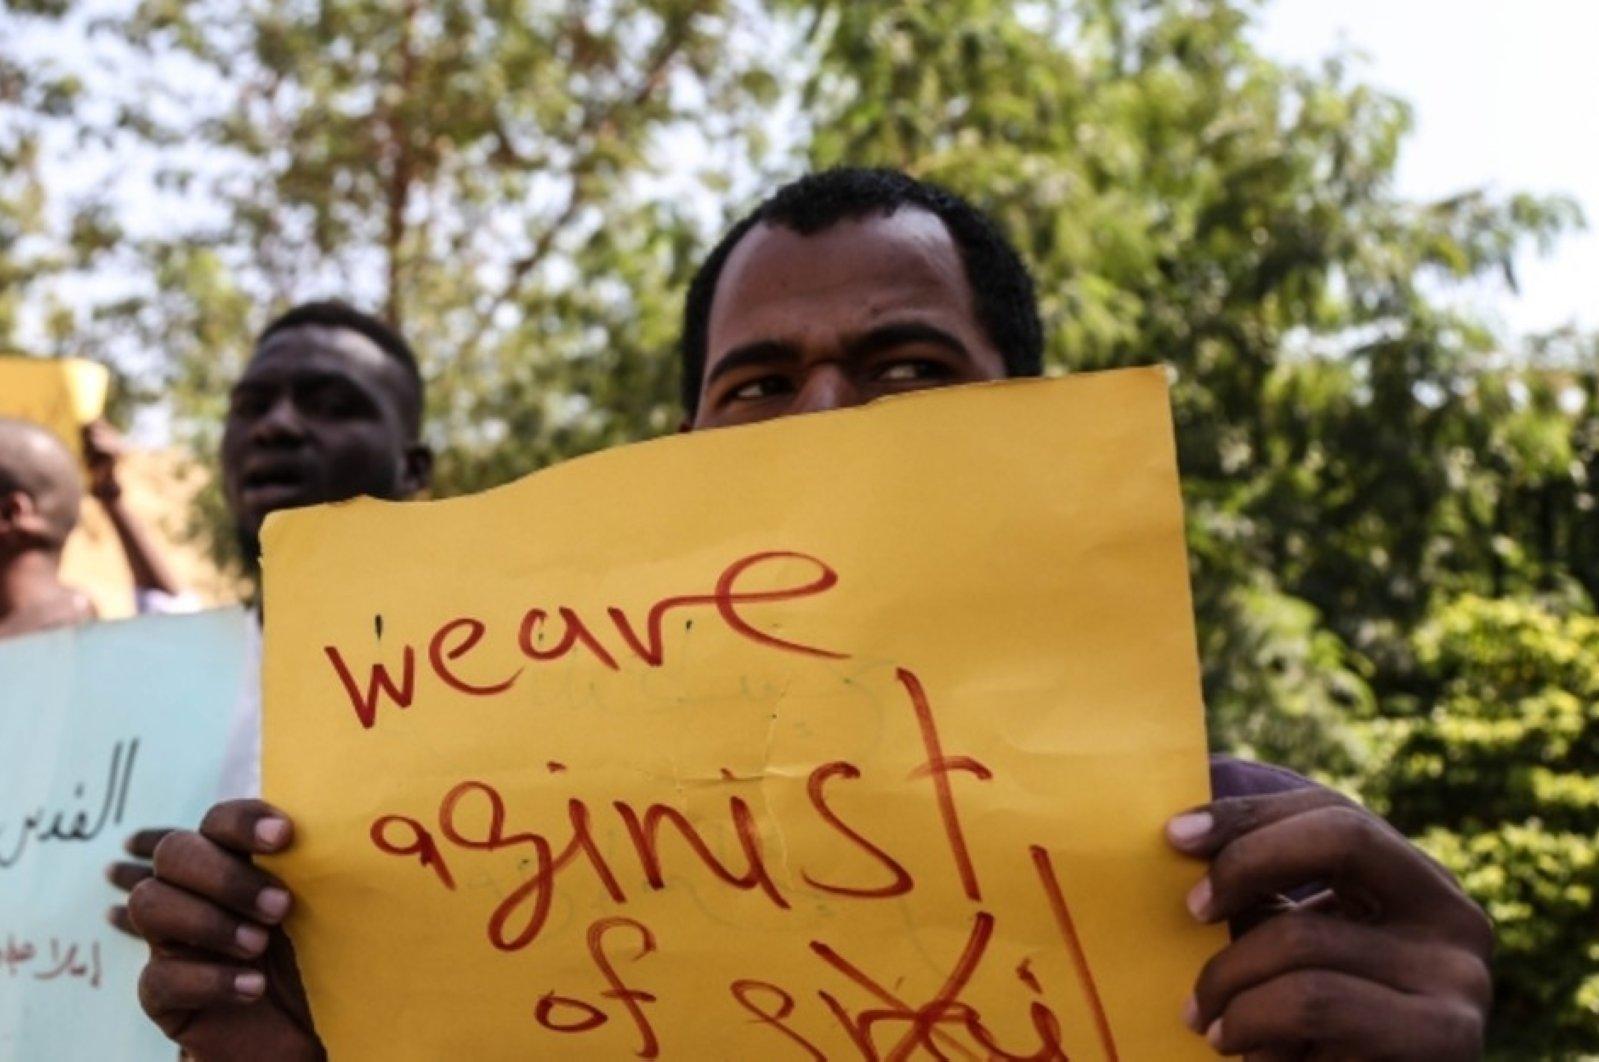 Protesters react to Sovereign Council chief Abdel Fattah al-Burhan's meeting with Israeli Prime Minister Benjamin Netanyahu, Khartoum, Sudan, Feb. 4, 2020. (AA Photo)